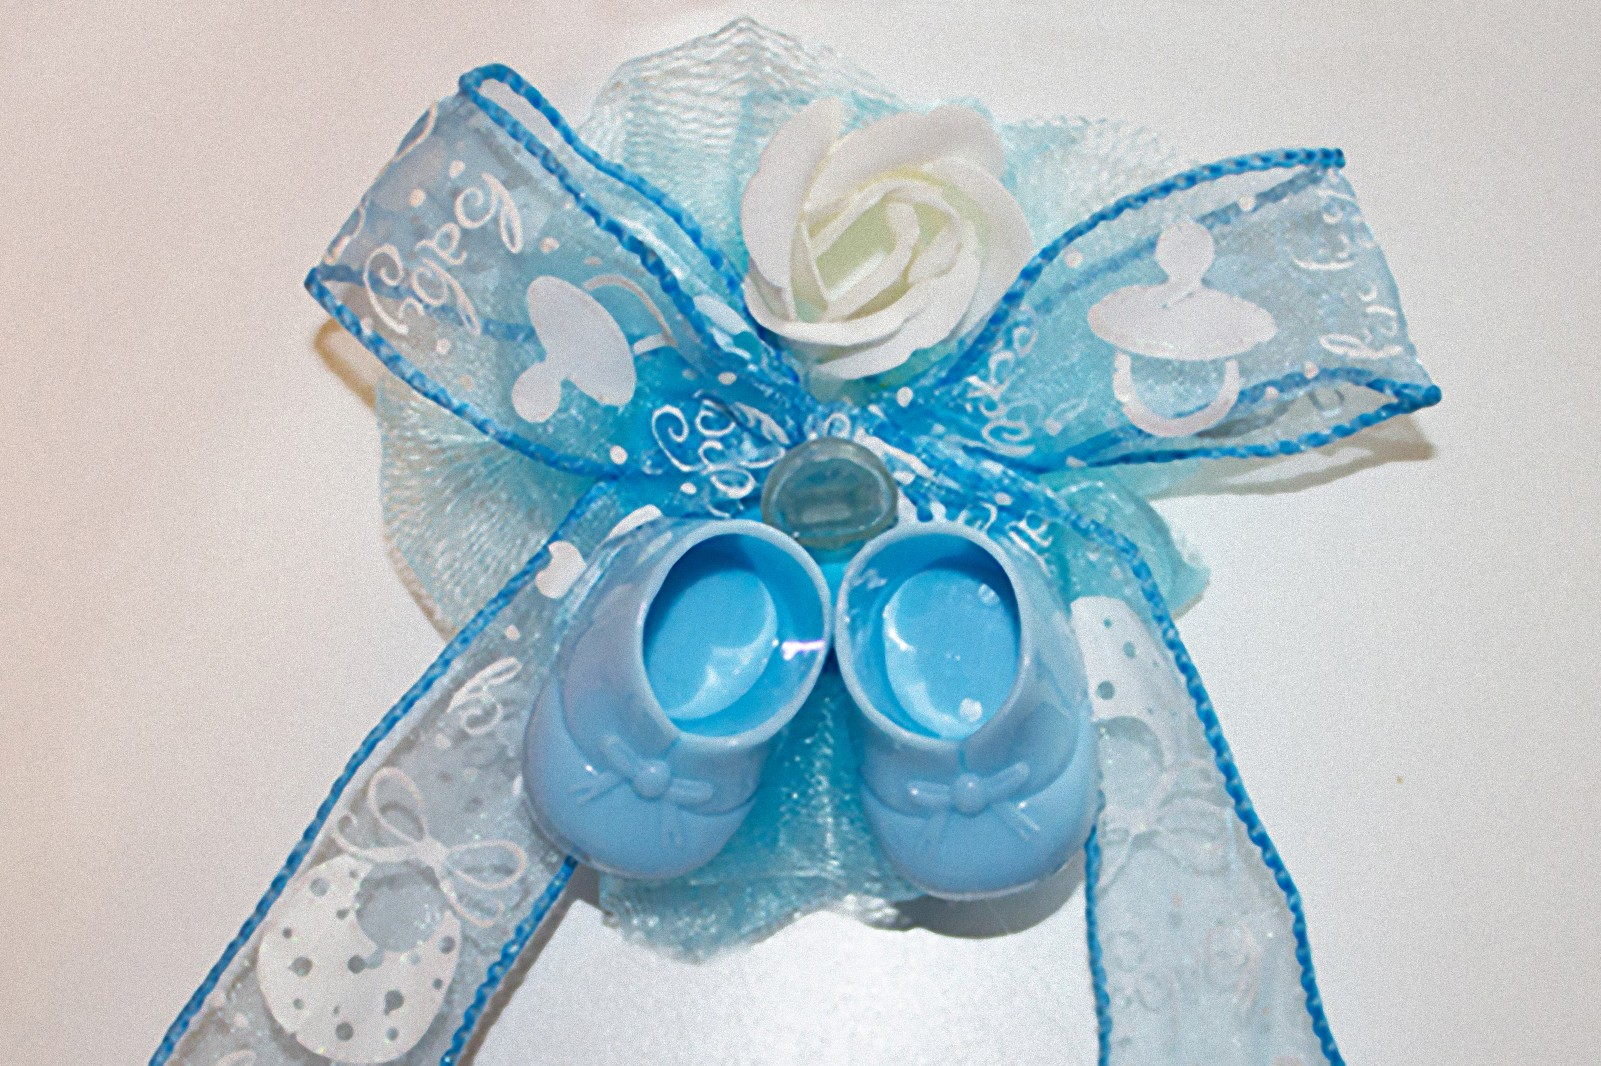 Baby Shower Guest Pins Baby Guest Pins Baby Shower Pins Baby Guest Corsage Baby Guest Favor Pins Baby Elephant Corsage